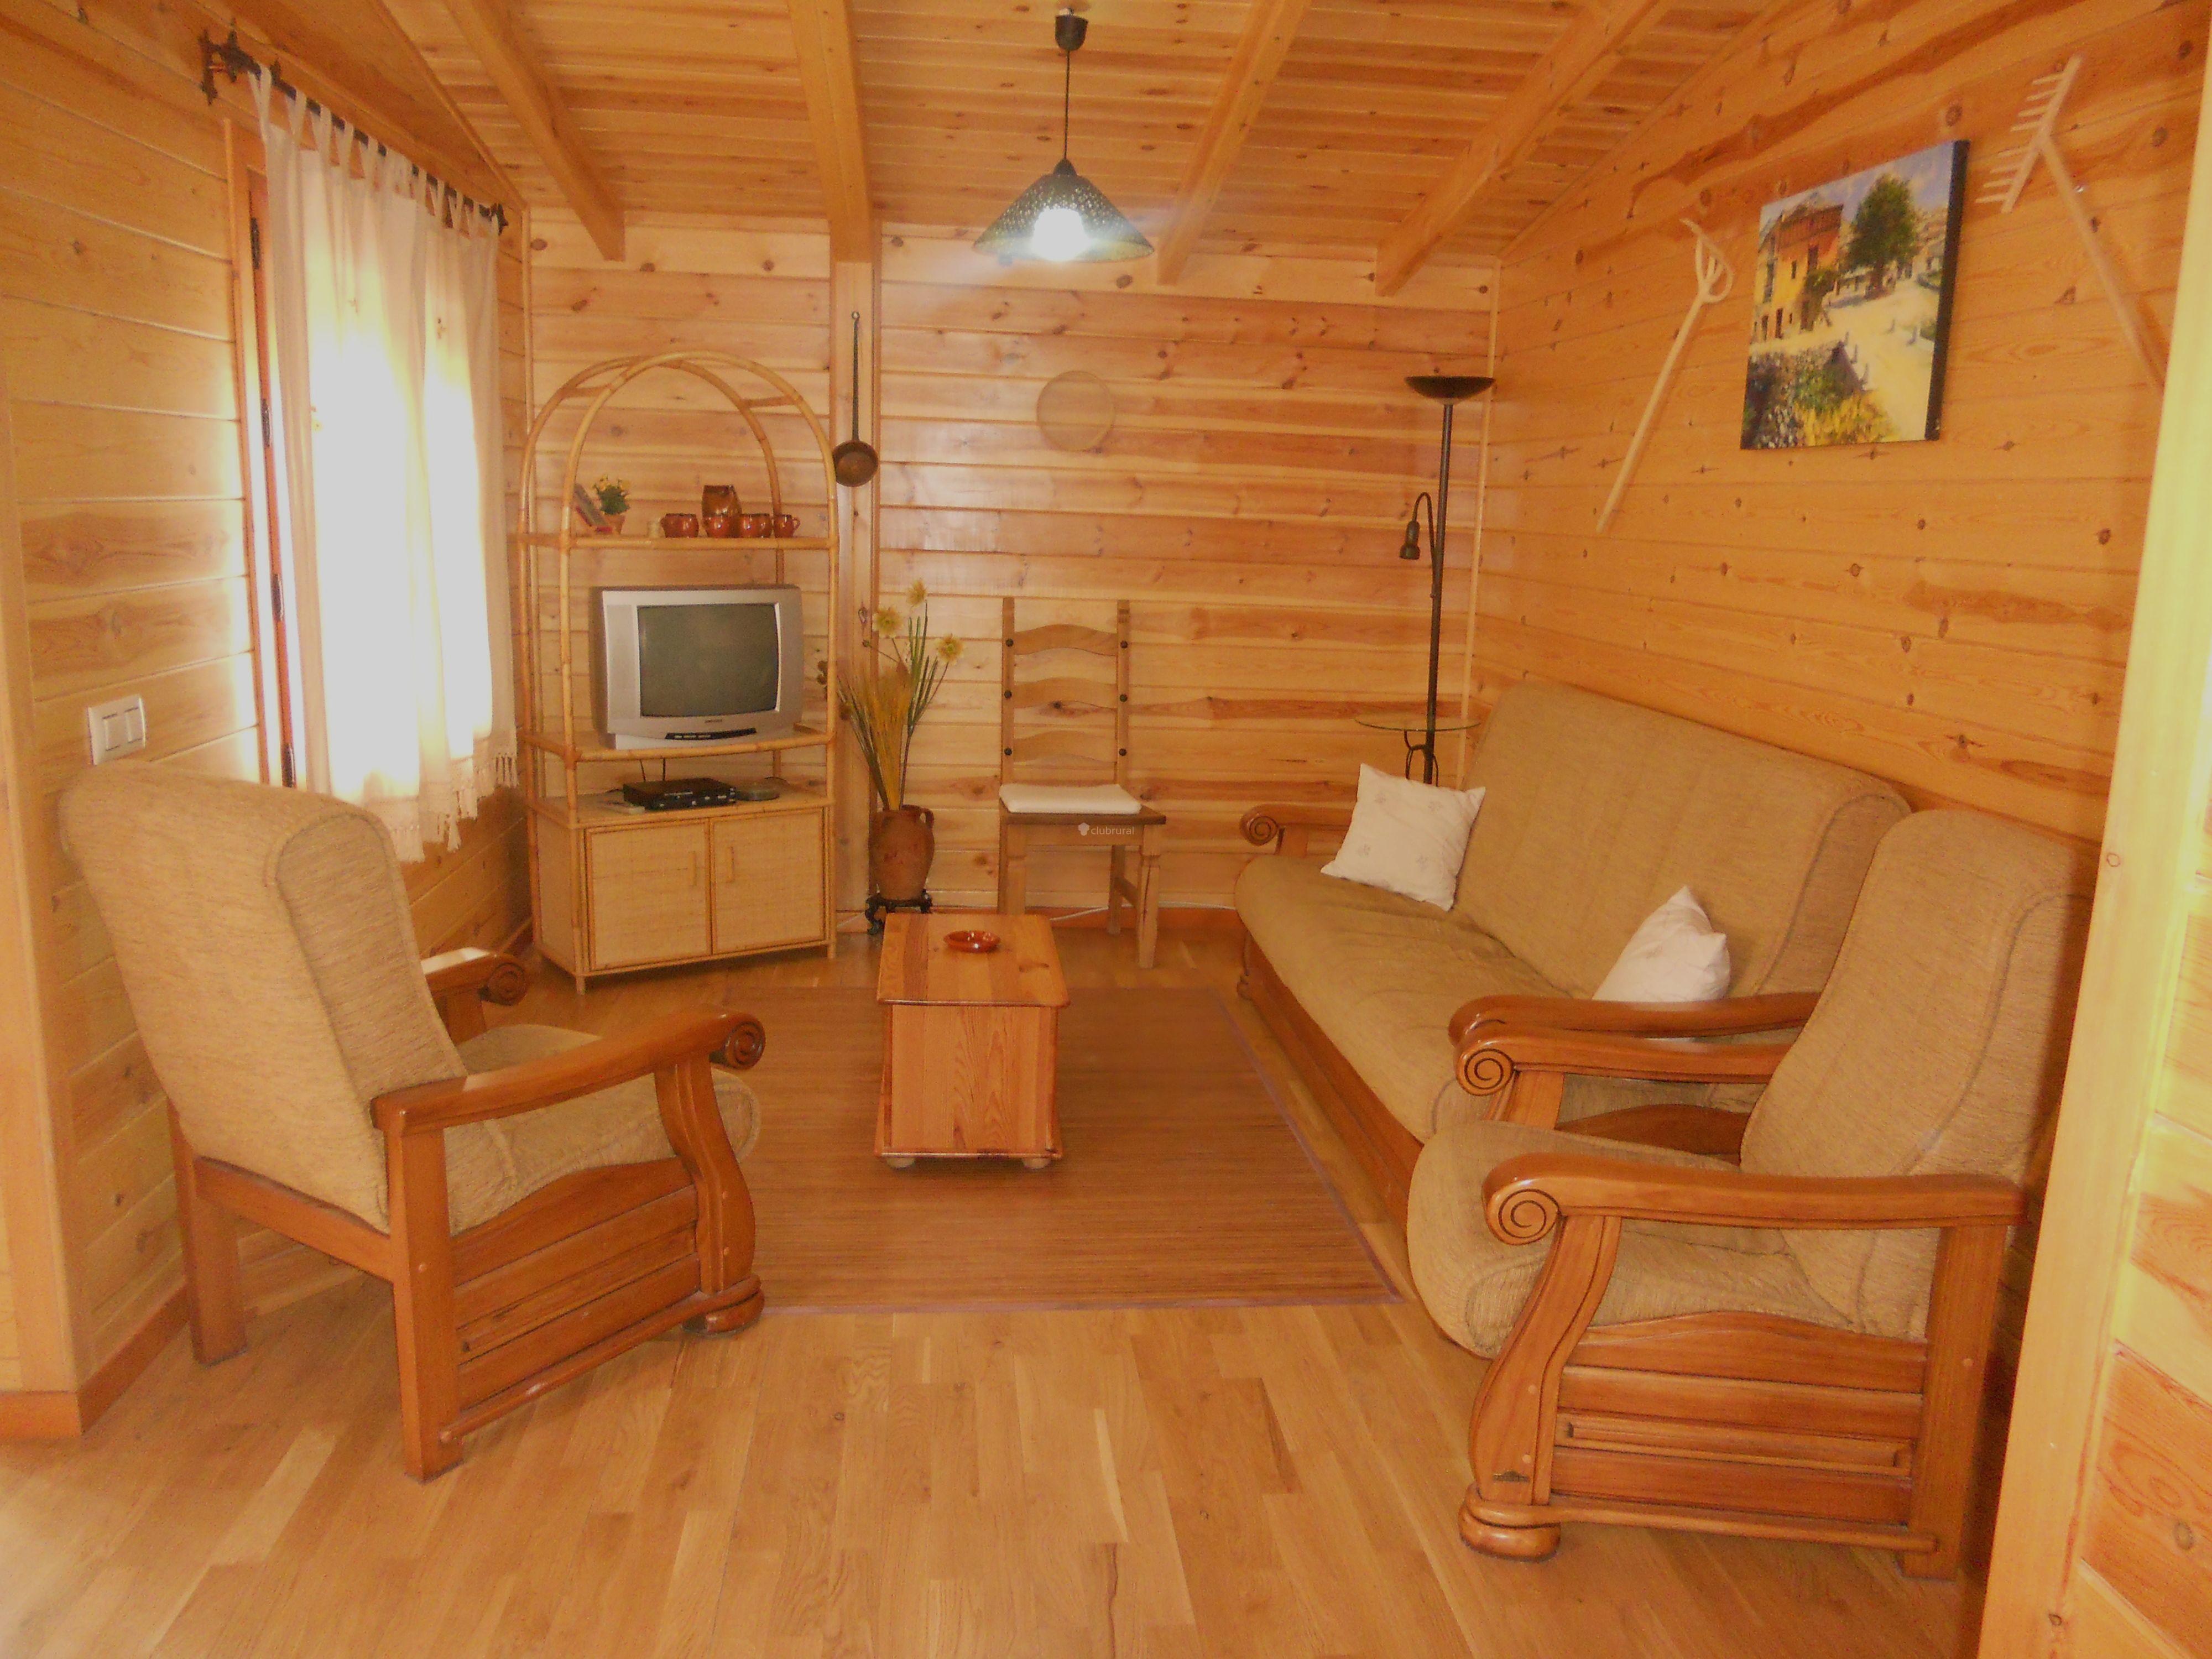 Fotos de la casita de madera segovia sacramenia - La casita de madera ...